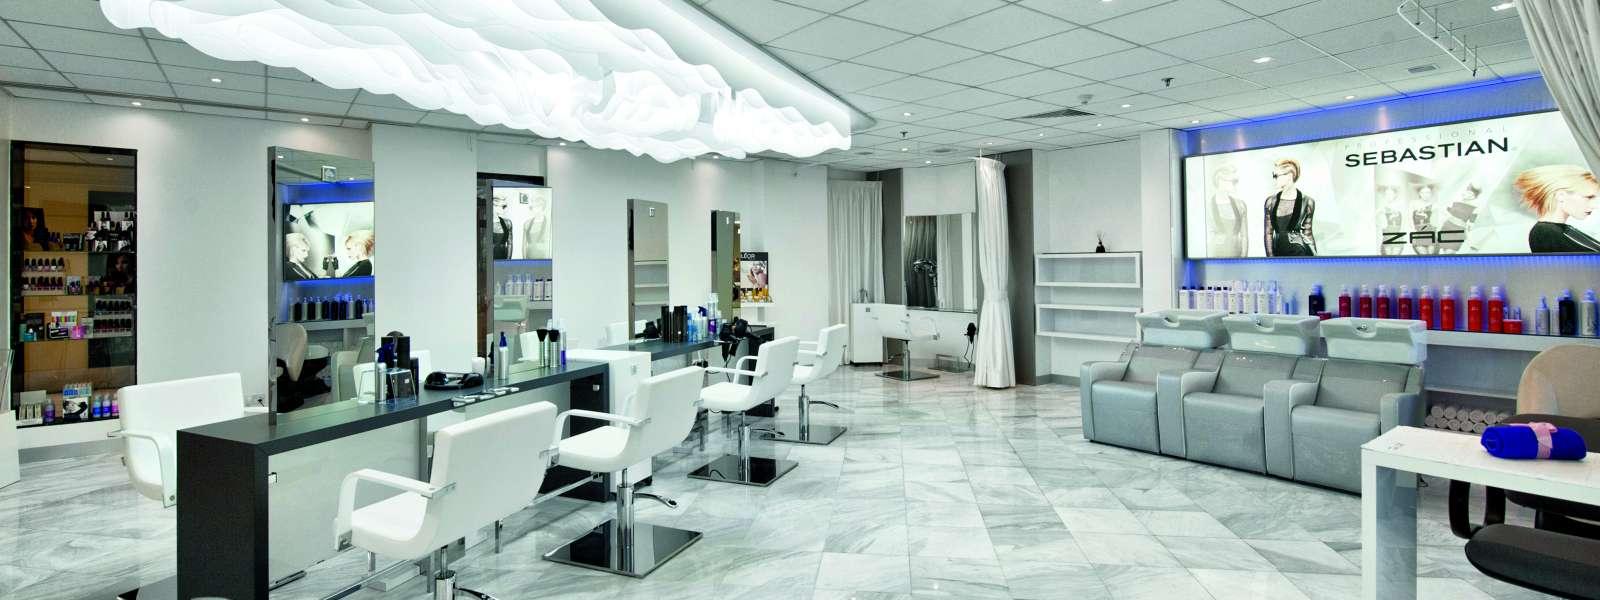 Nelson Mobilier Manufacturer Salon Furniture Made In France - Siege salon design